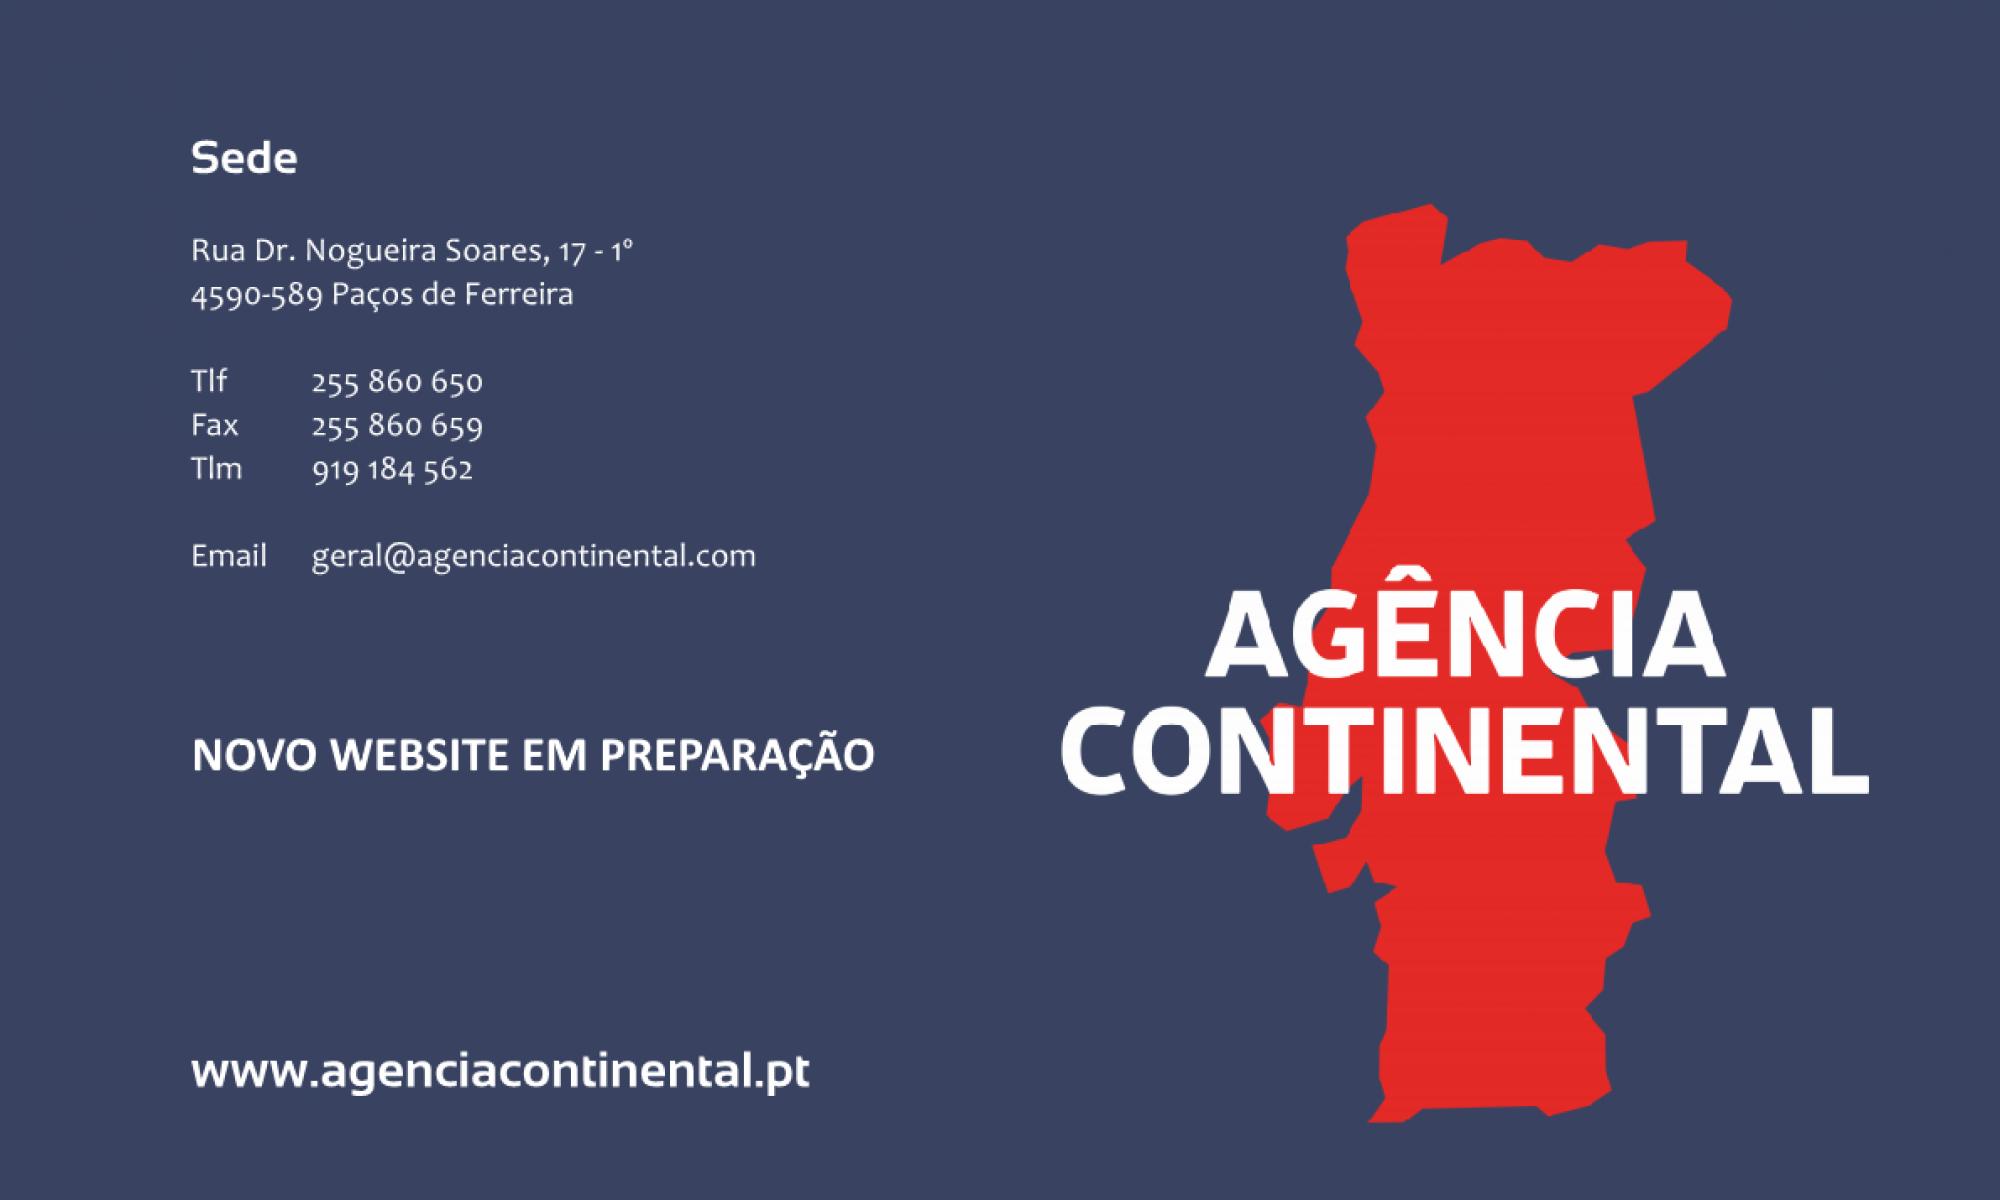 Agência Continental